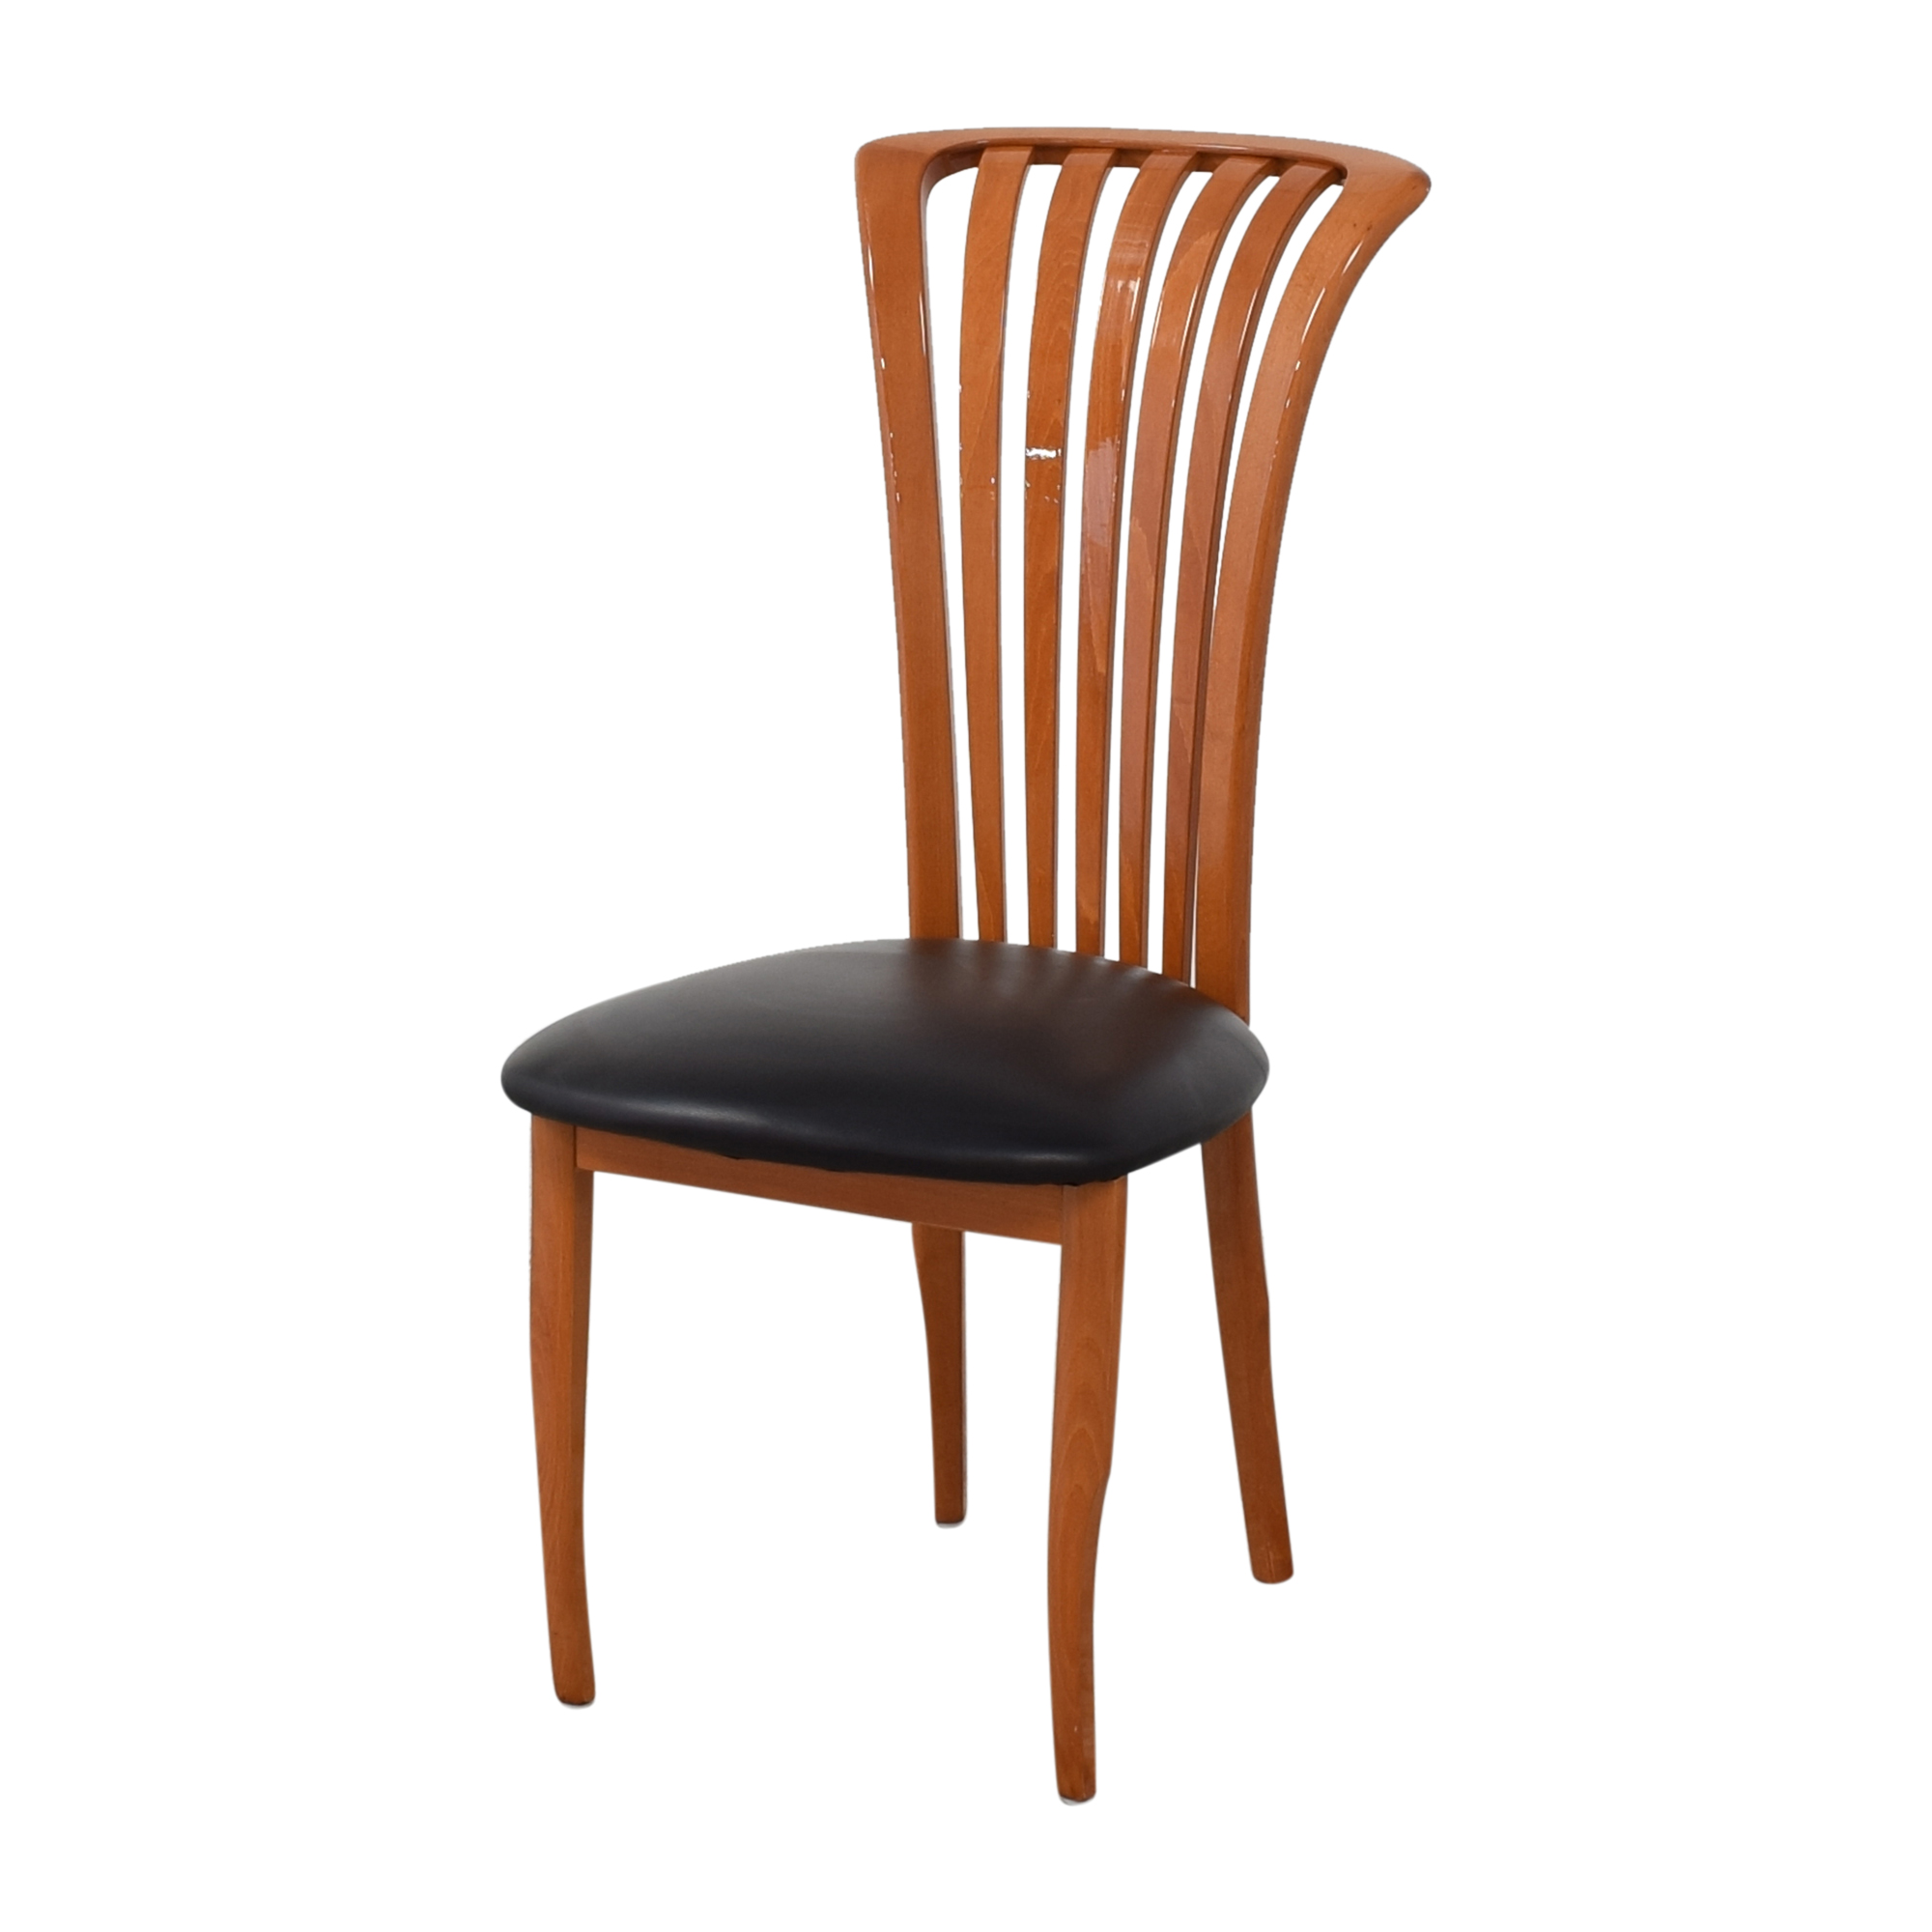 Pietro Costantini Pietro Costantini Modern Dining Chairs nj